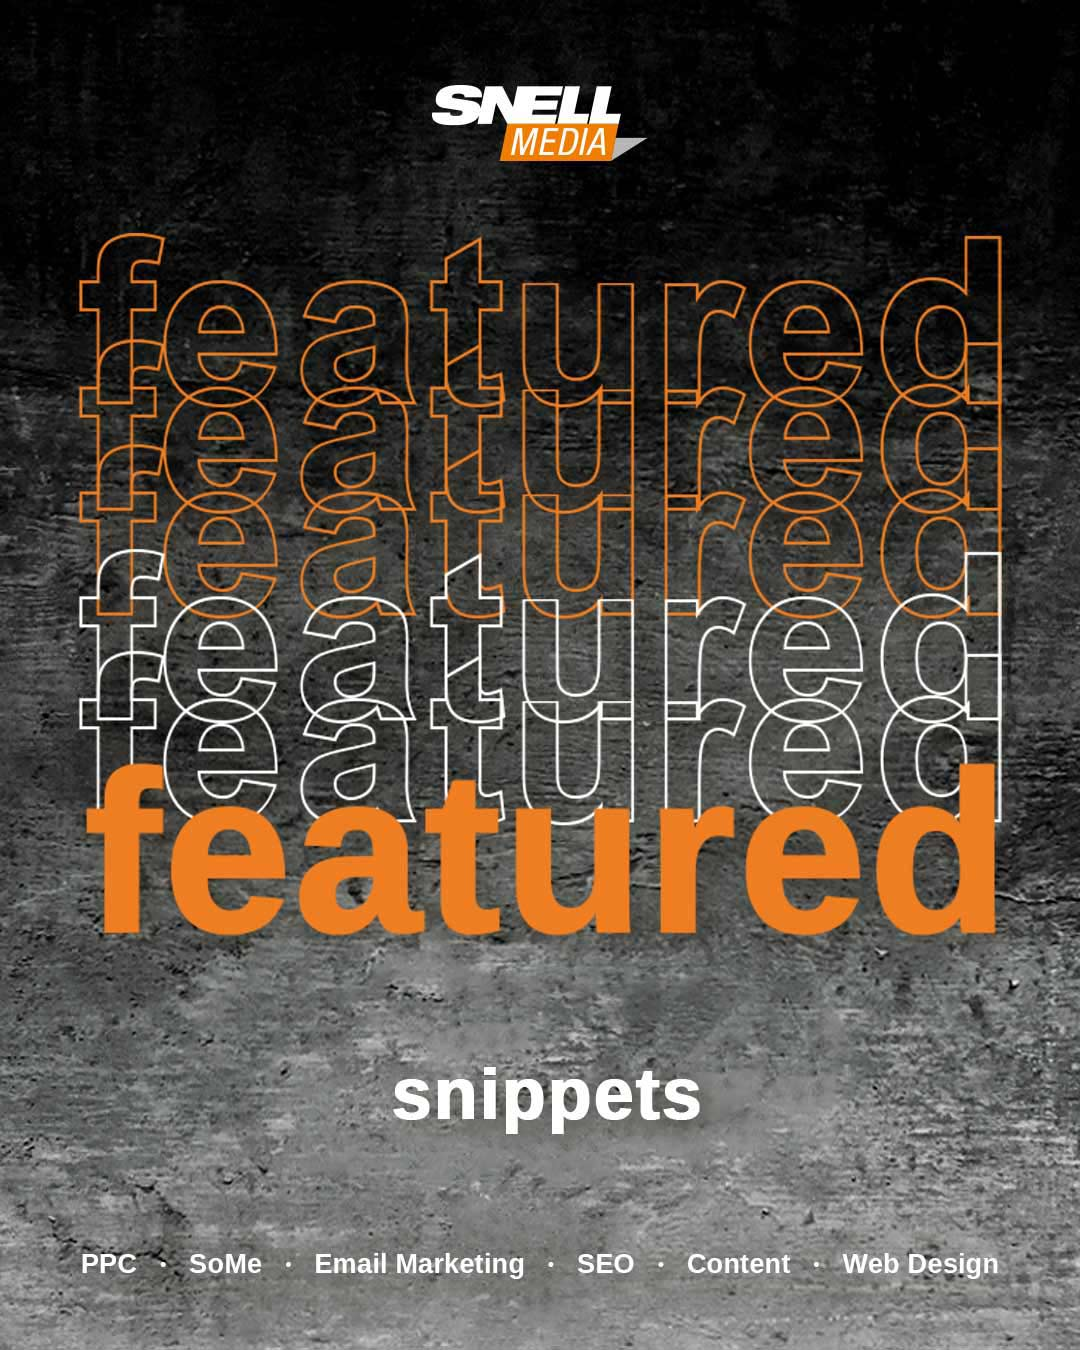 Featured Snippets 14th B2B Digital Marketing Trend